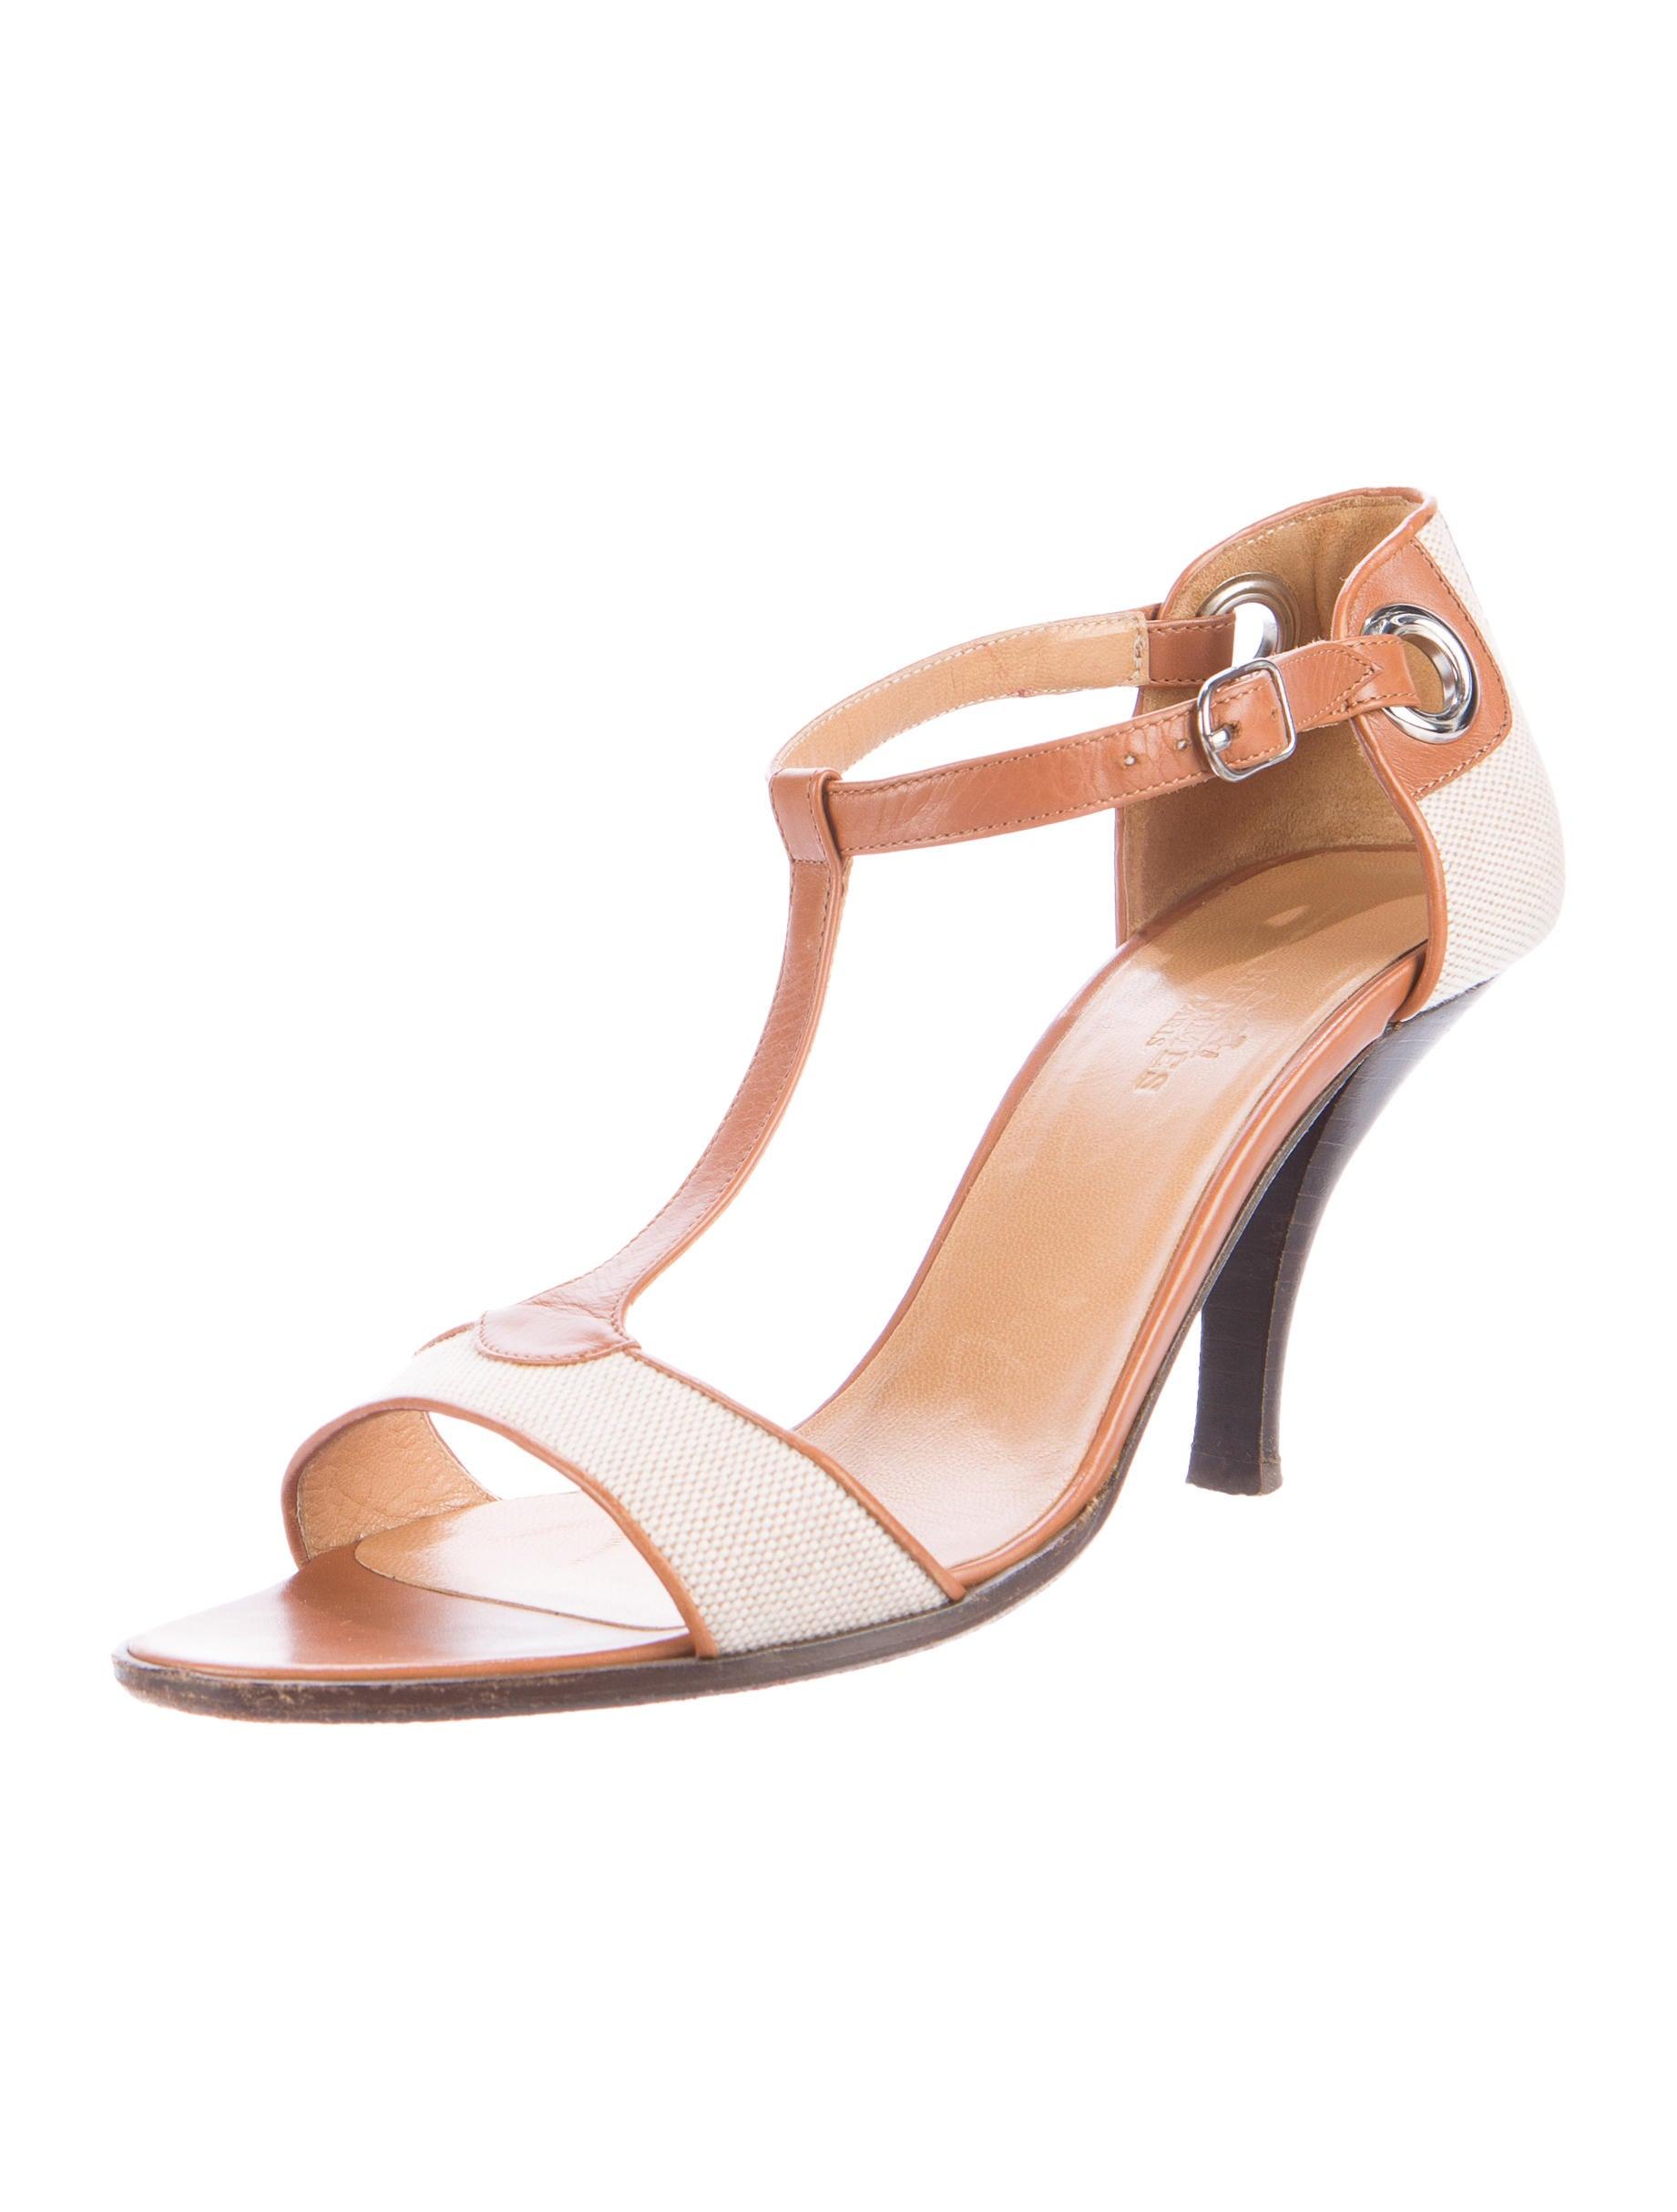 Hermes Womens Sandals